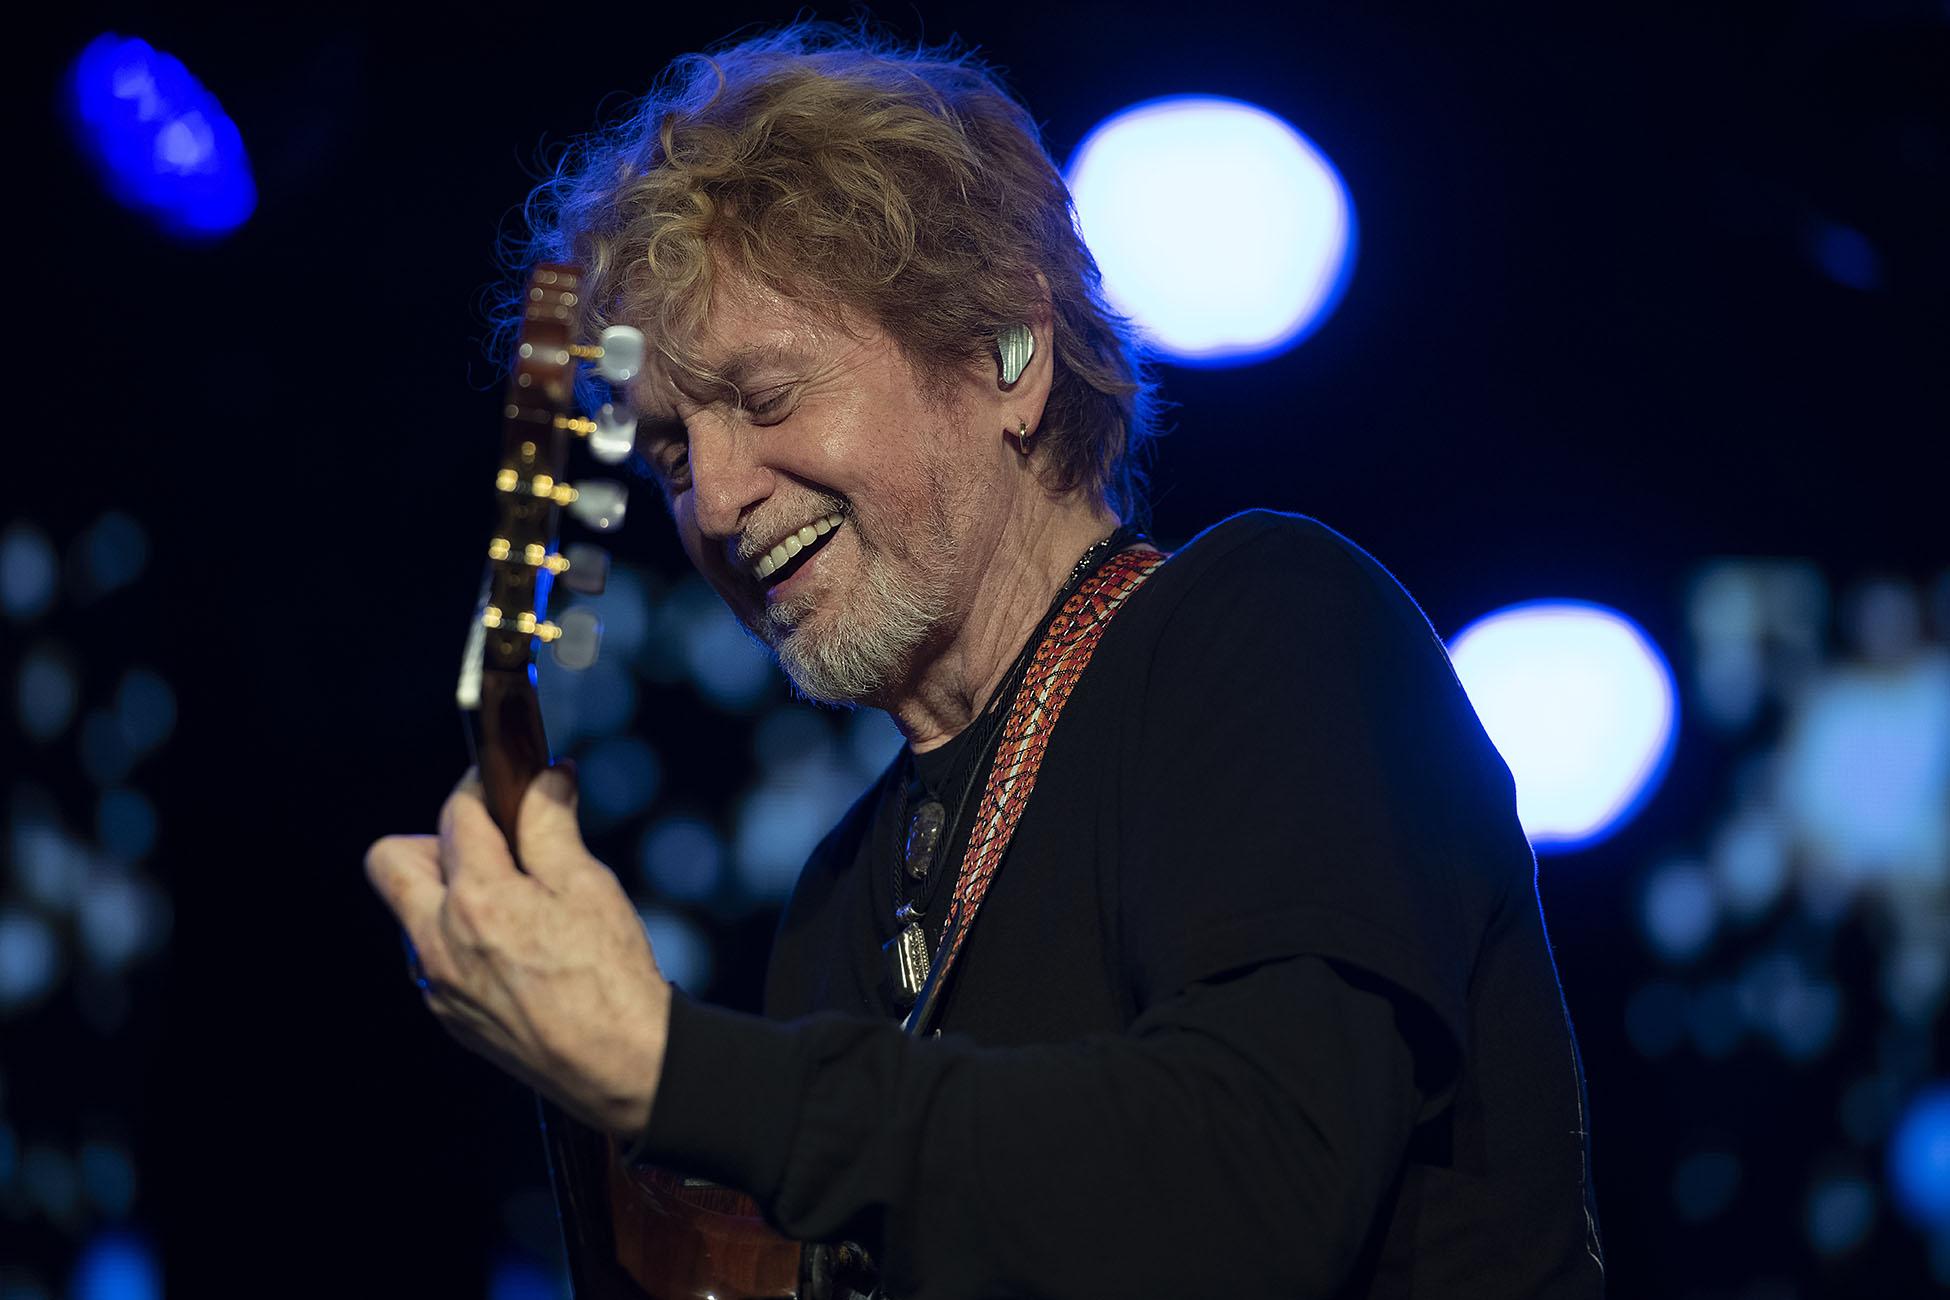 Jon Anderson at the Tupelo Music Hall, April 7, 2019